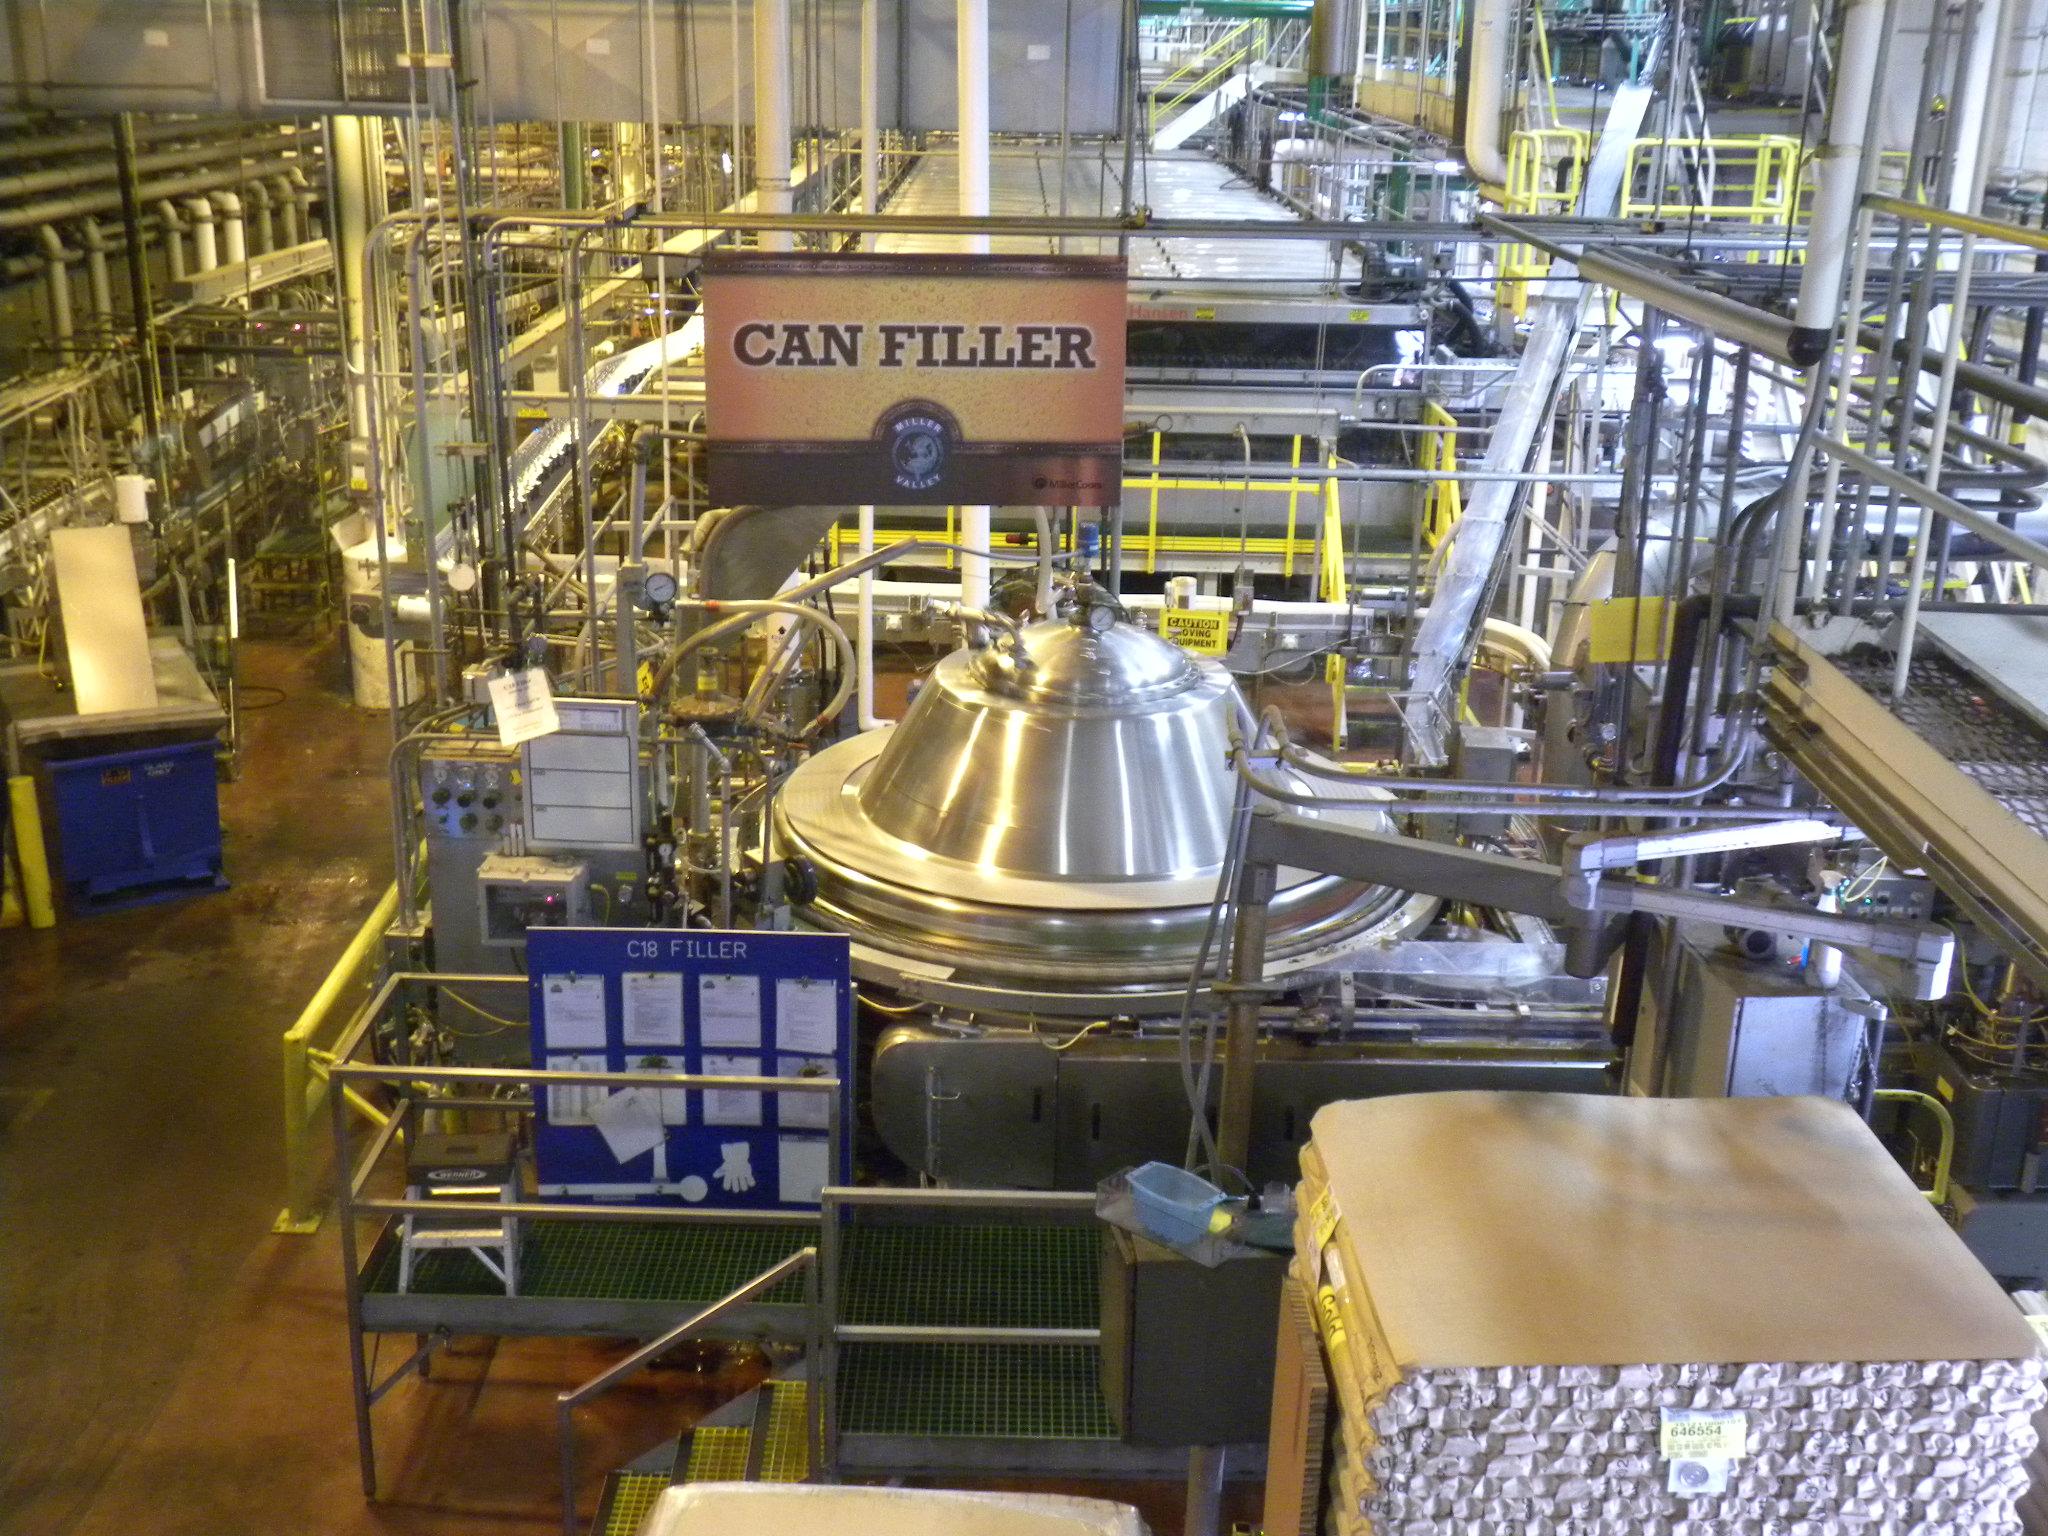 Miller canning